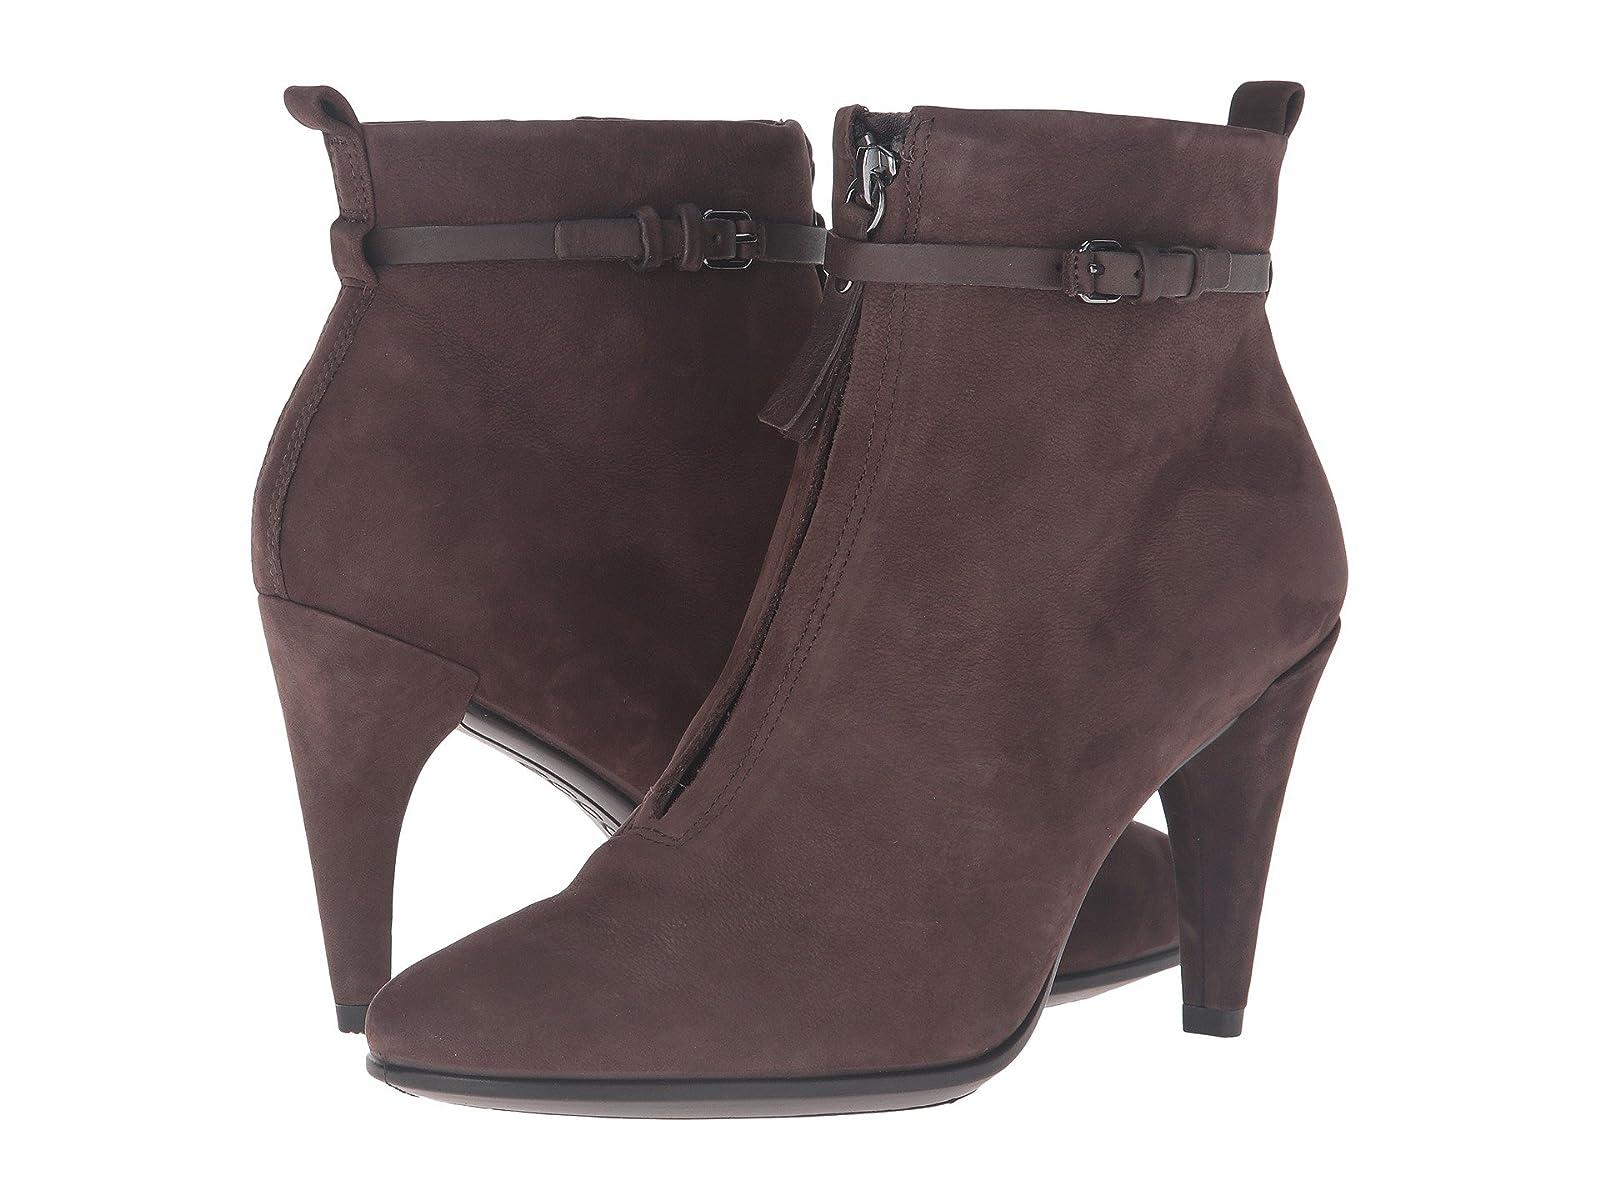 ECCO Shape 75 Sleek Ankle BootCheap and distinctive eye-catching shoes